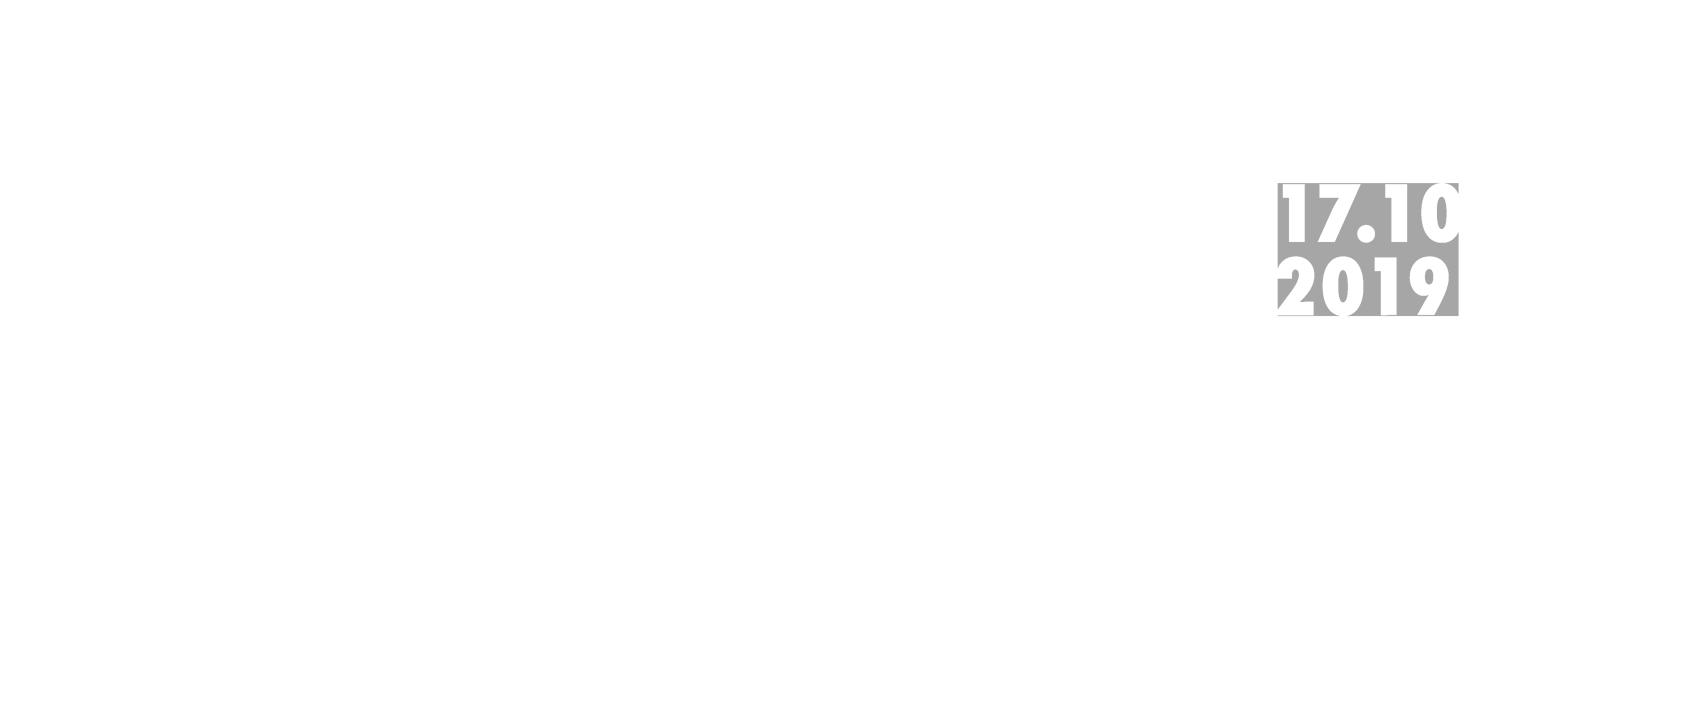 Mauno-koivisto-takters-president.png